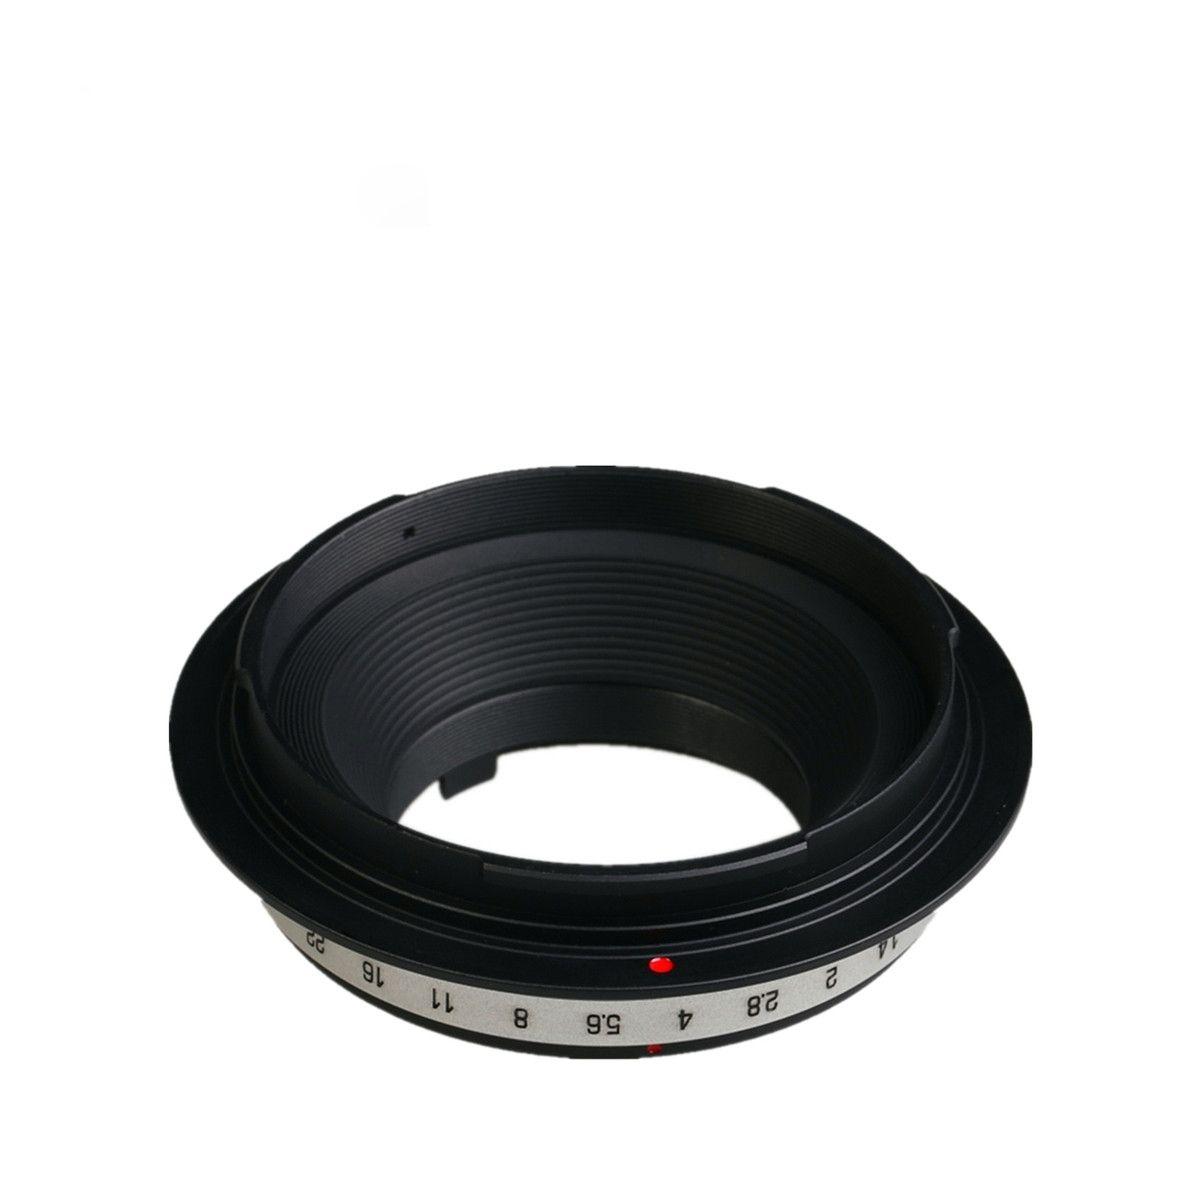 Kipon Adapter Fr Contarex Auf Fuji Gfx Foto Walser Mamiya 645 Mount Lens To Medium Format Camera